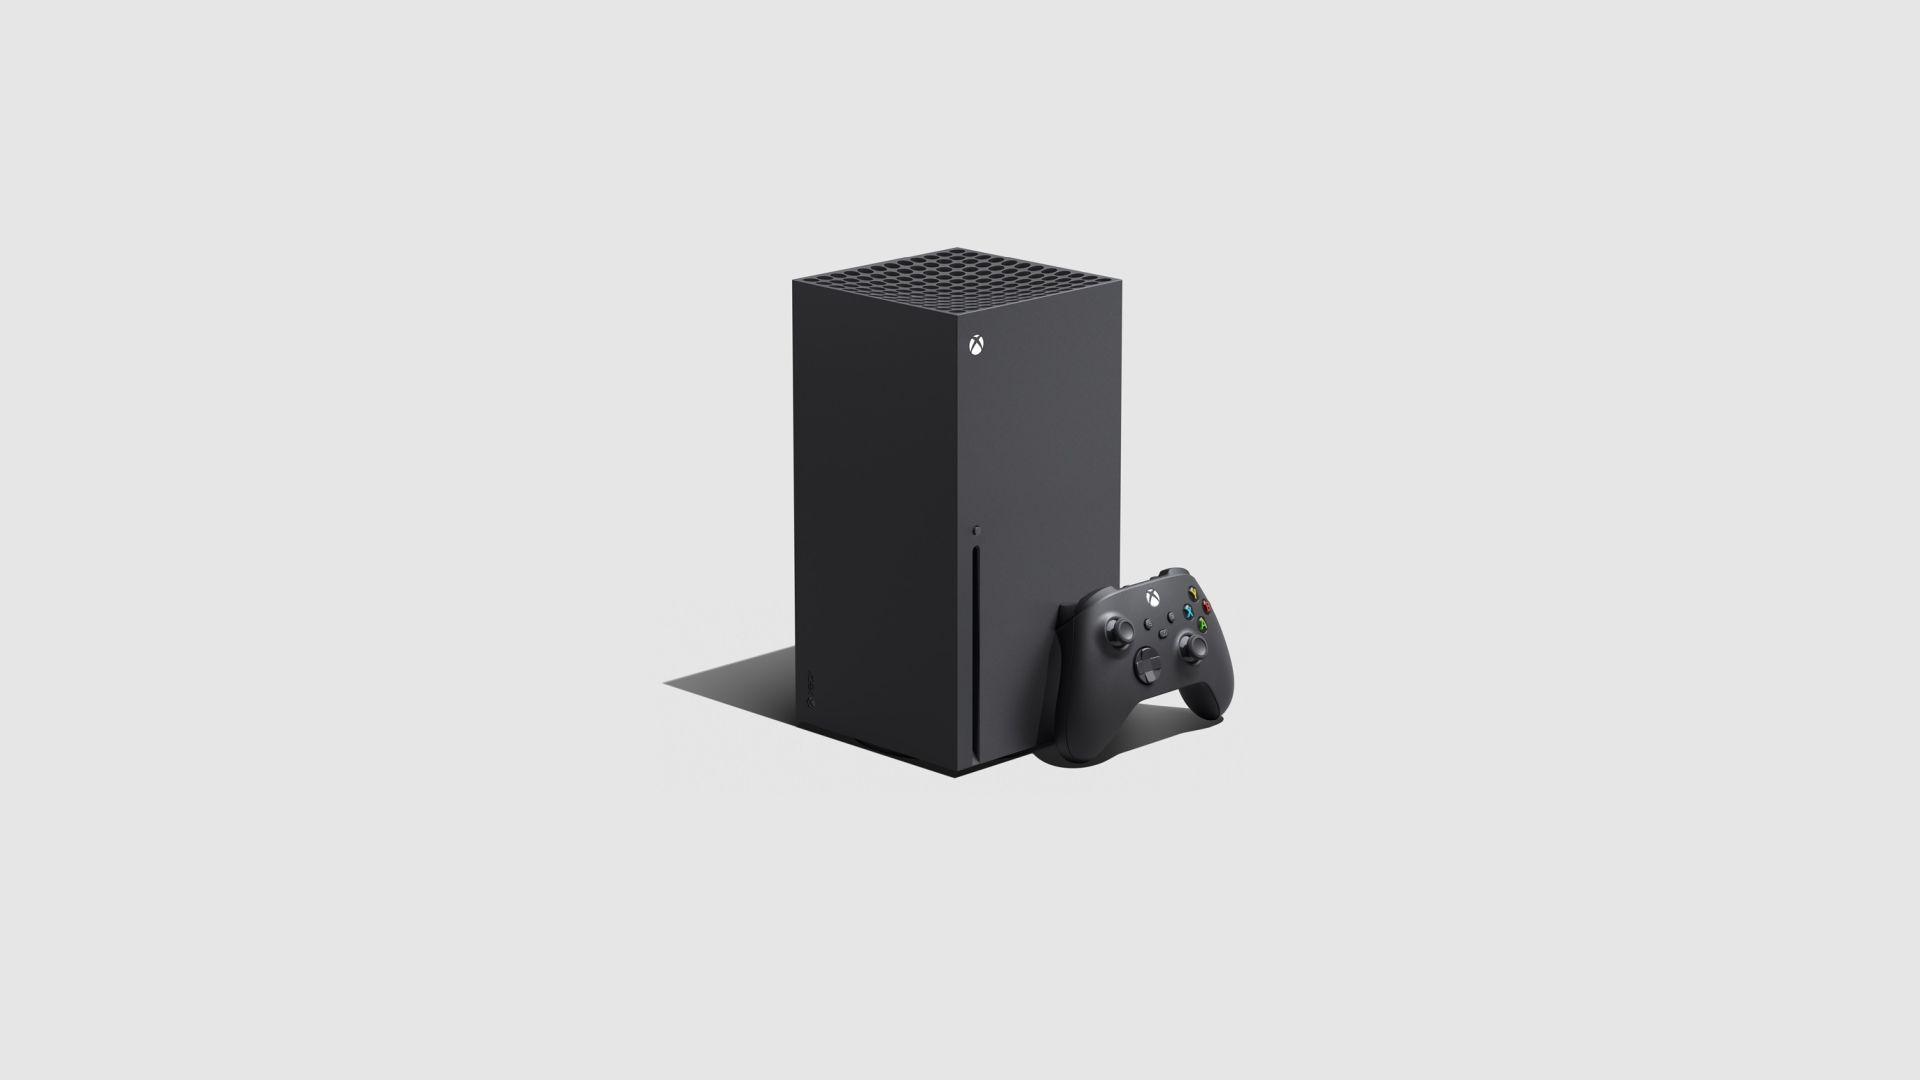 Xbox Series X best 4K Ultra HD Blu-ray player